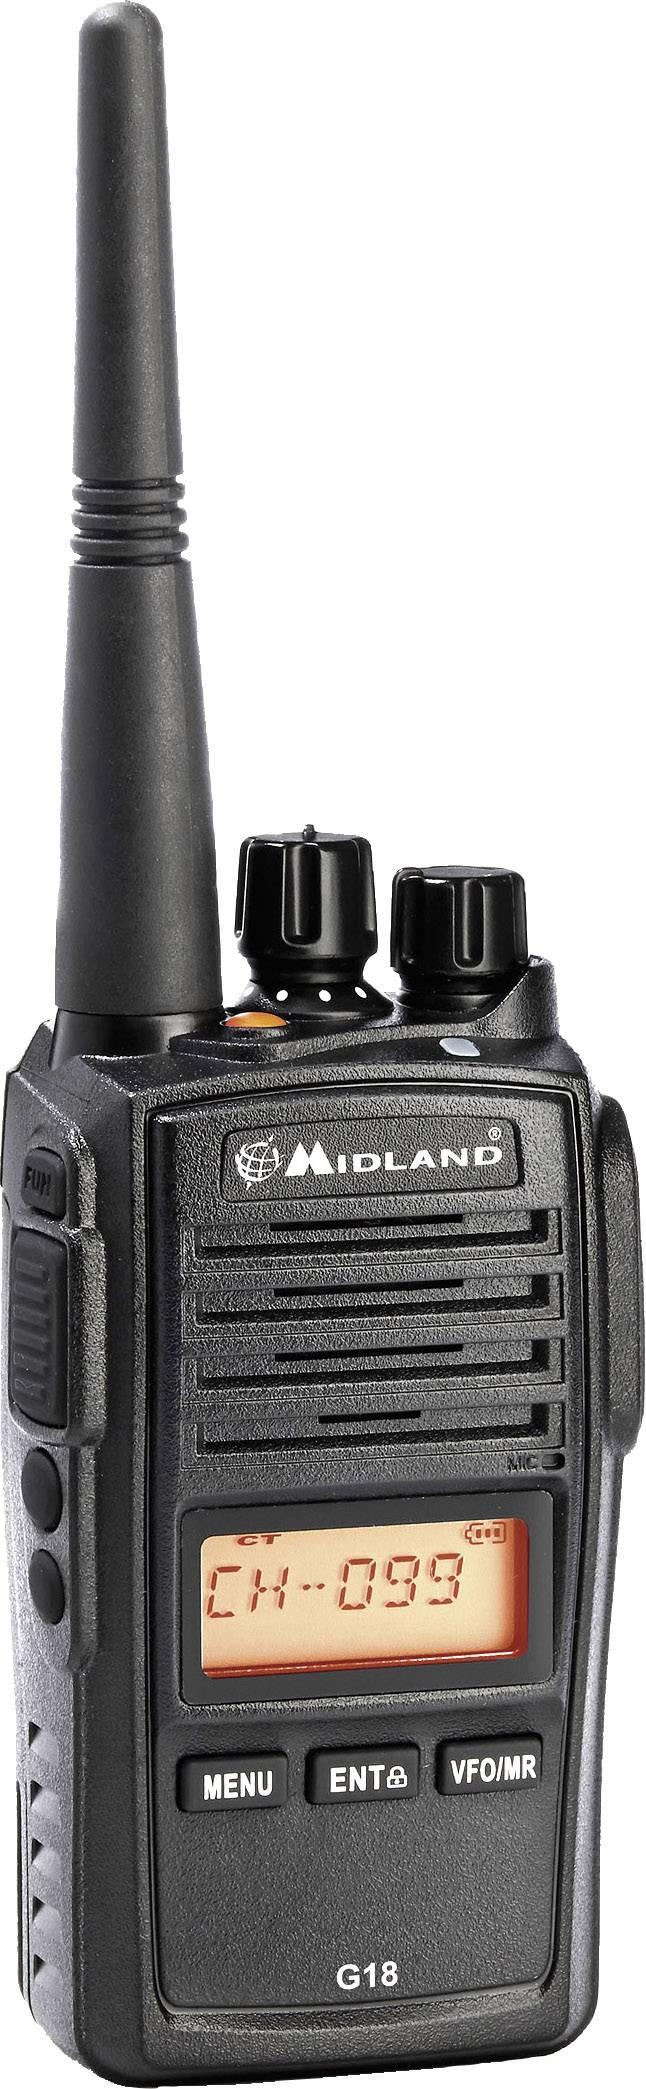 PMR radiostanice Midland G18 C1145